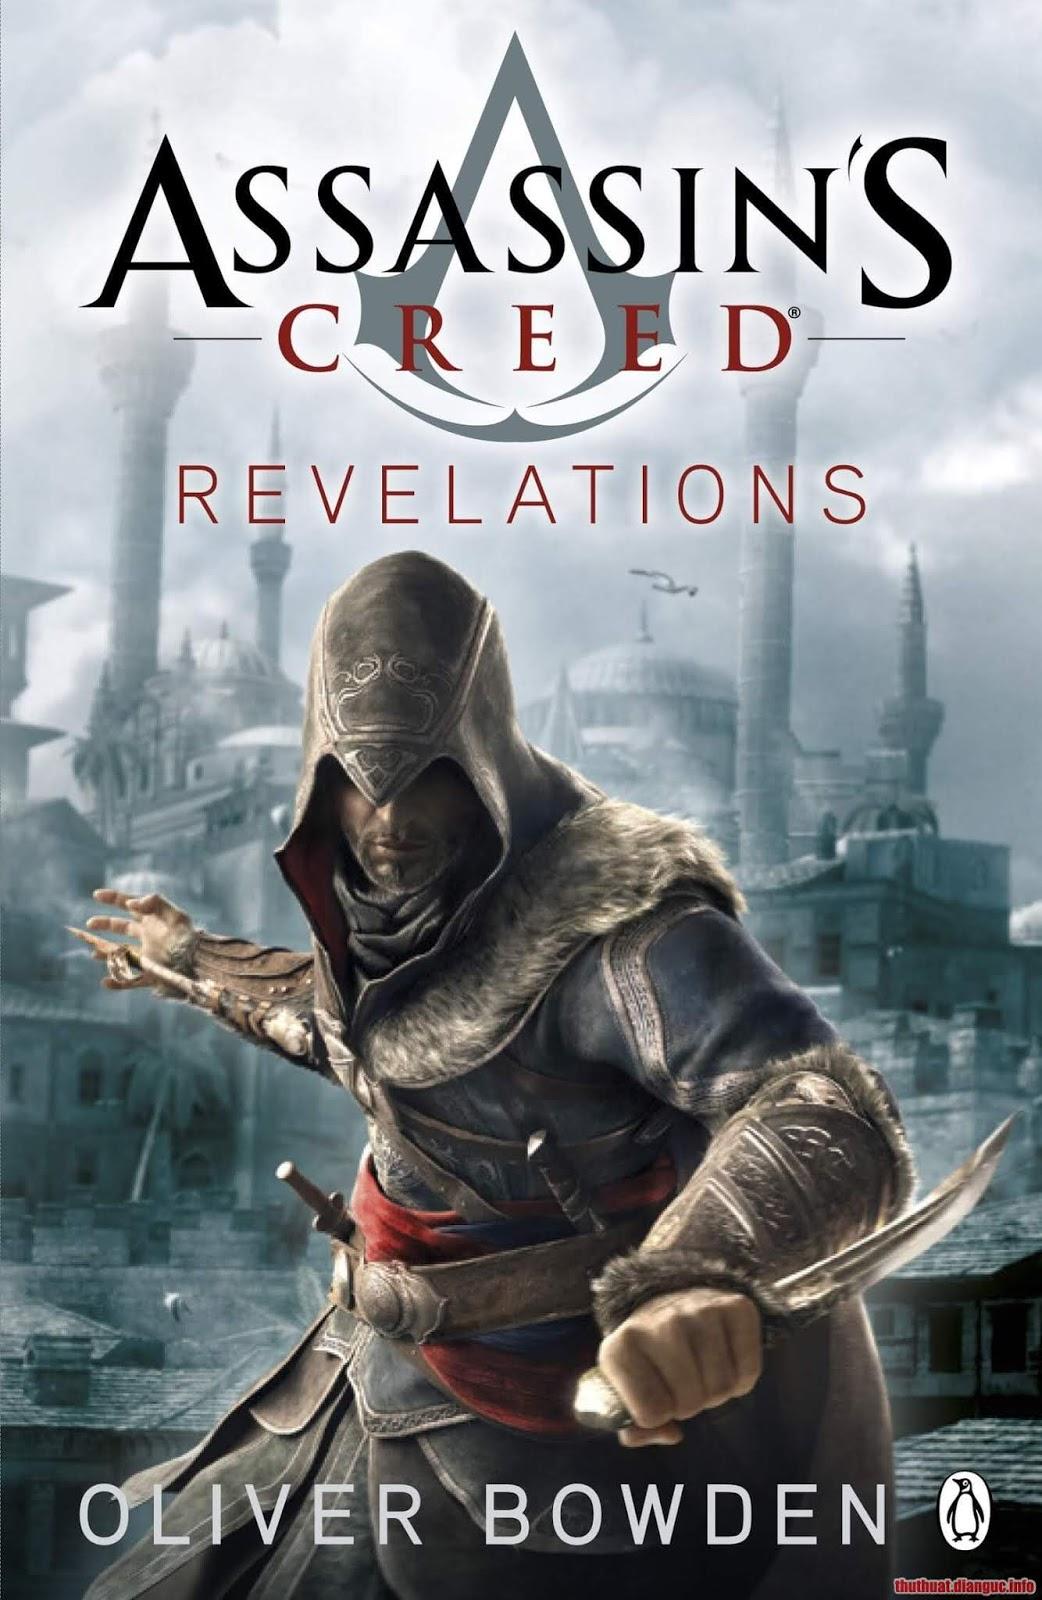 Download Game Assassin's Creed: Revelations Full Crack